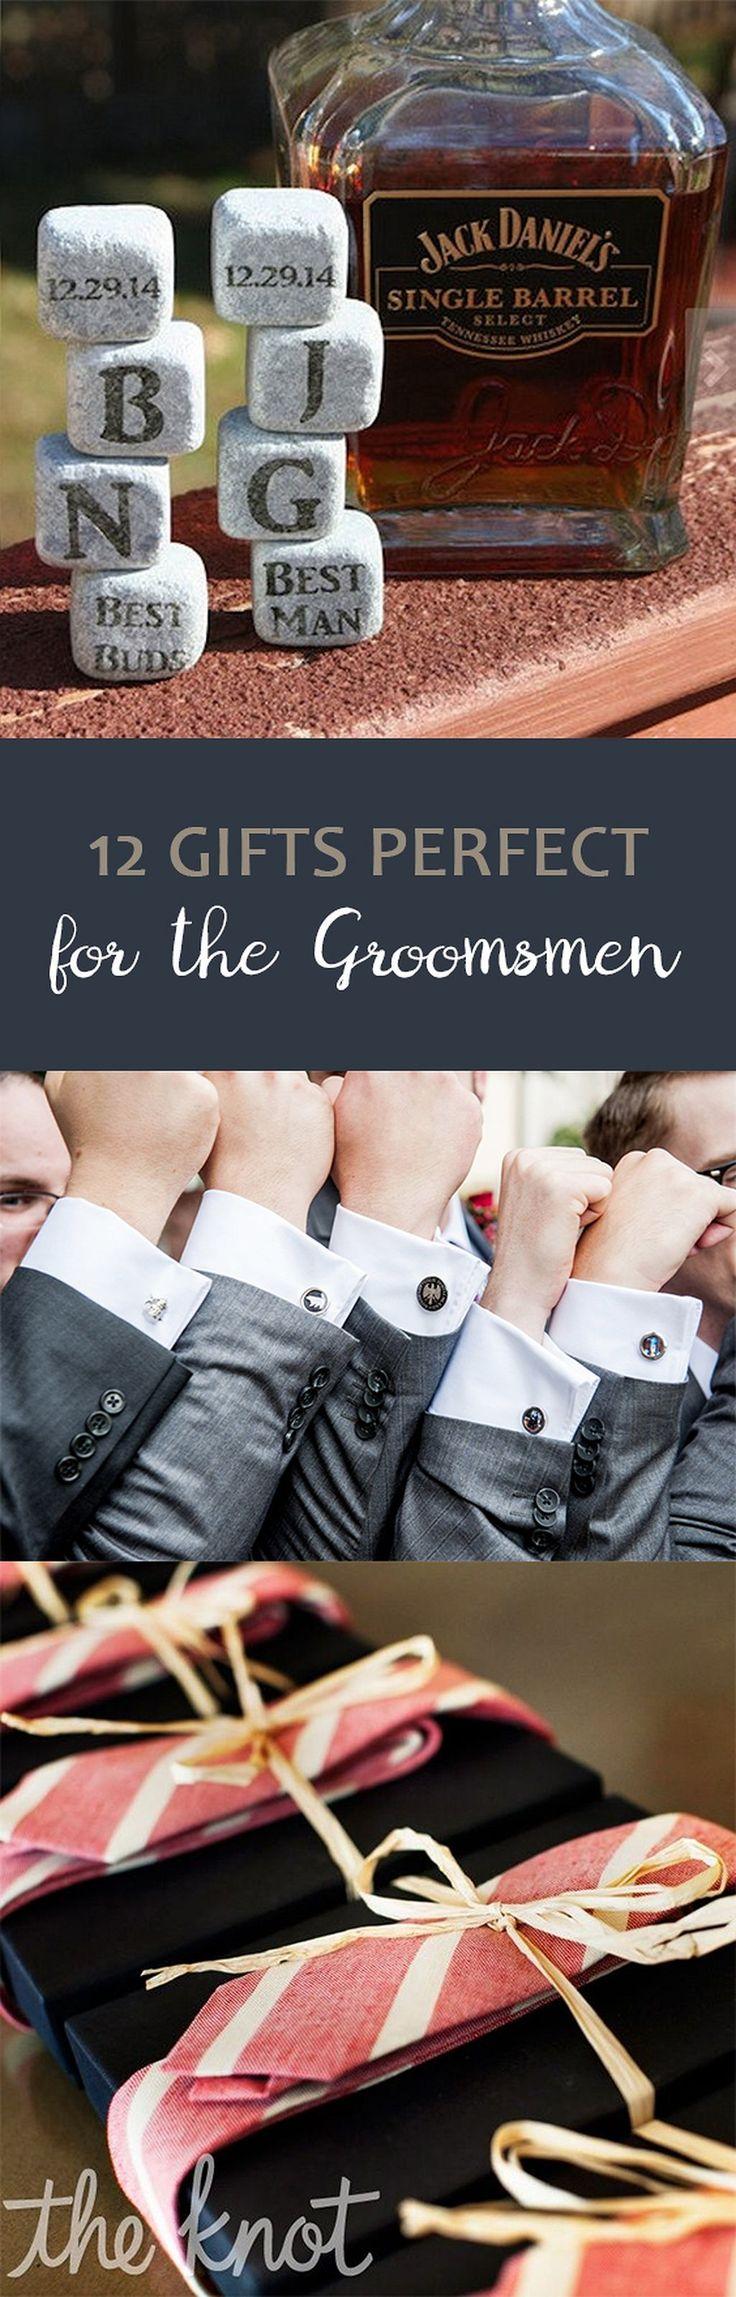 awesome 228 Groomsman Gift Ideas https://weddmagz.com/228-groomsman-gift-ideas/